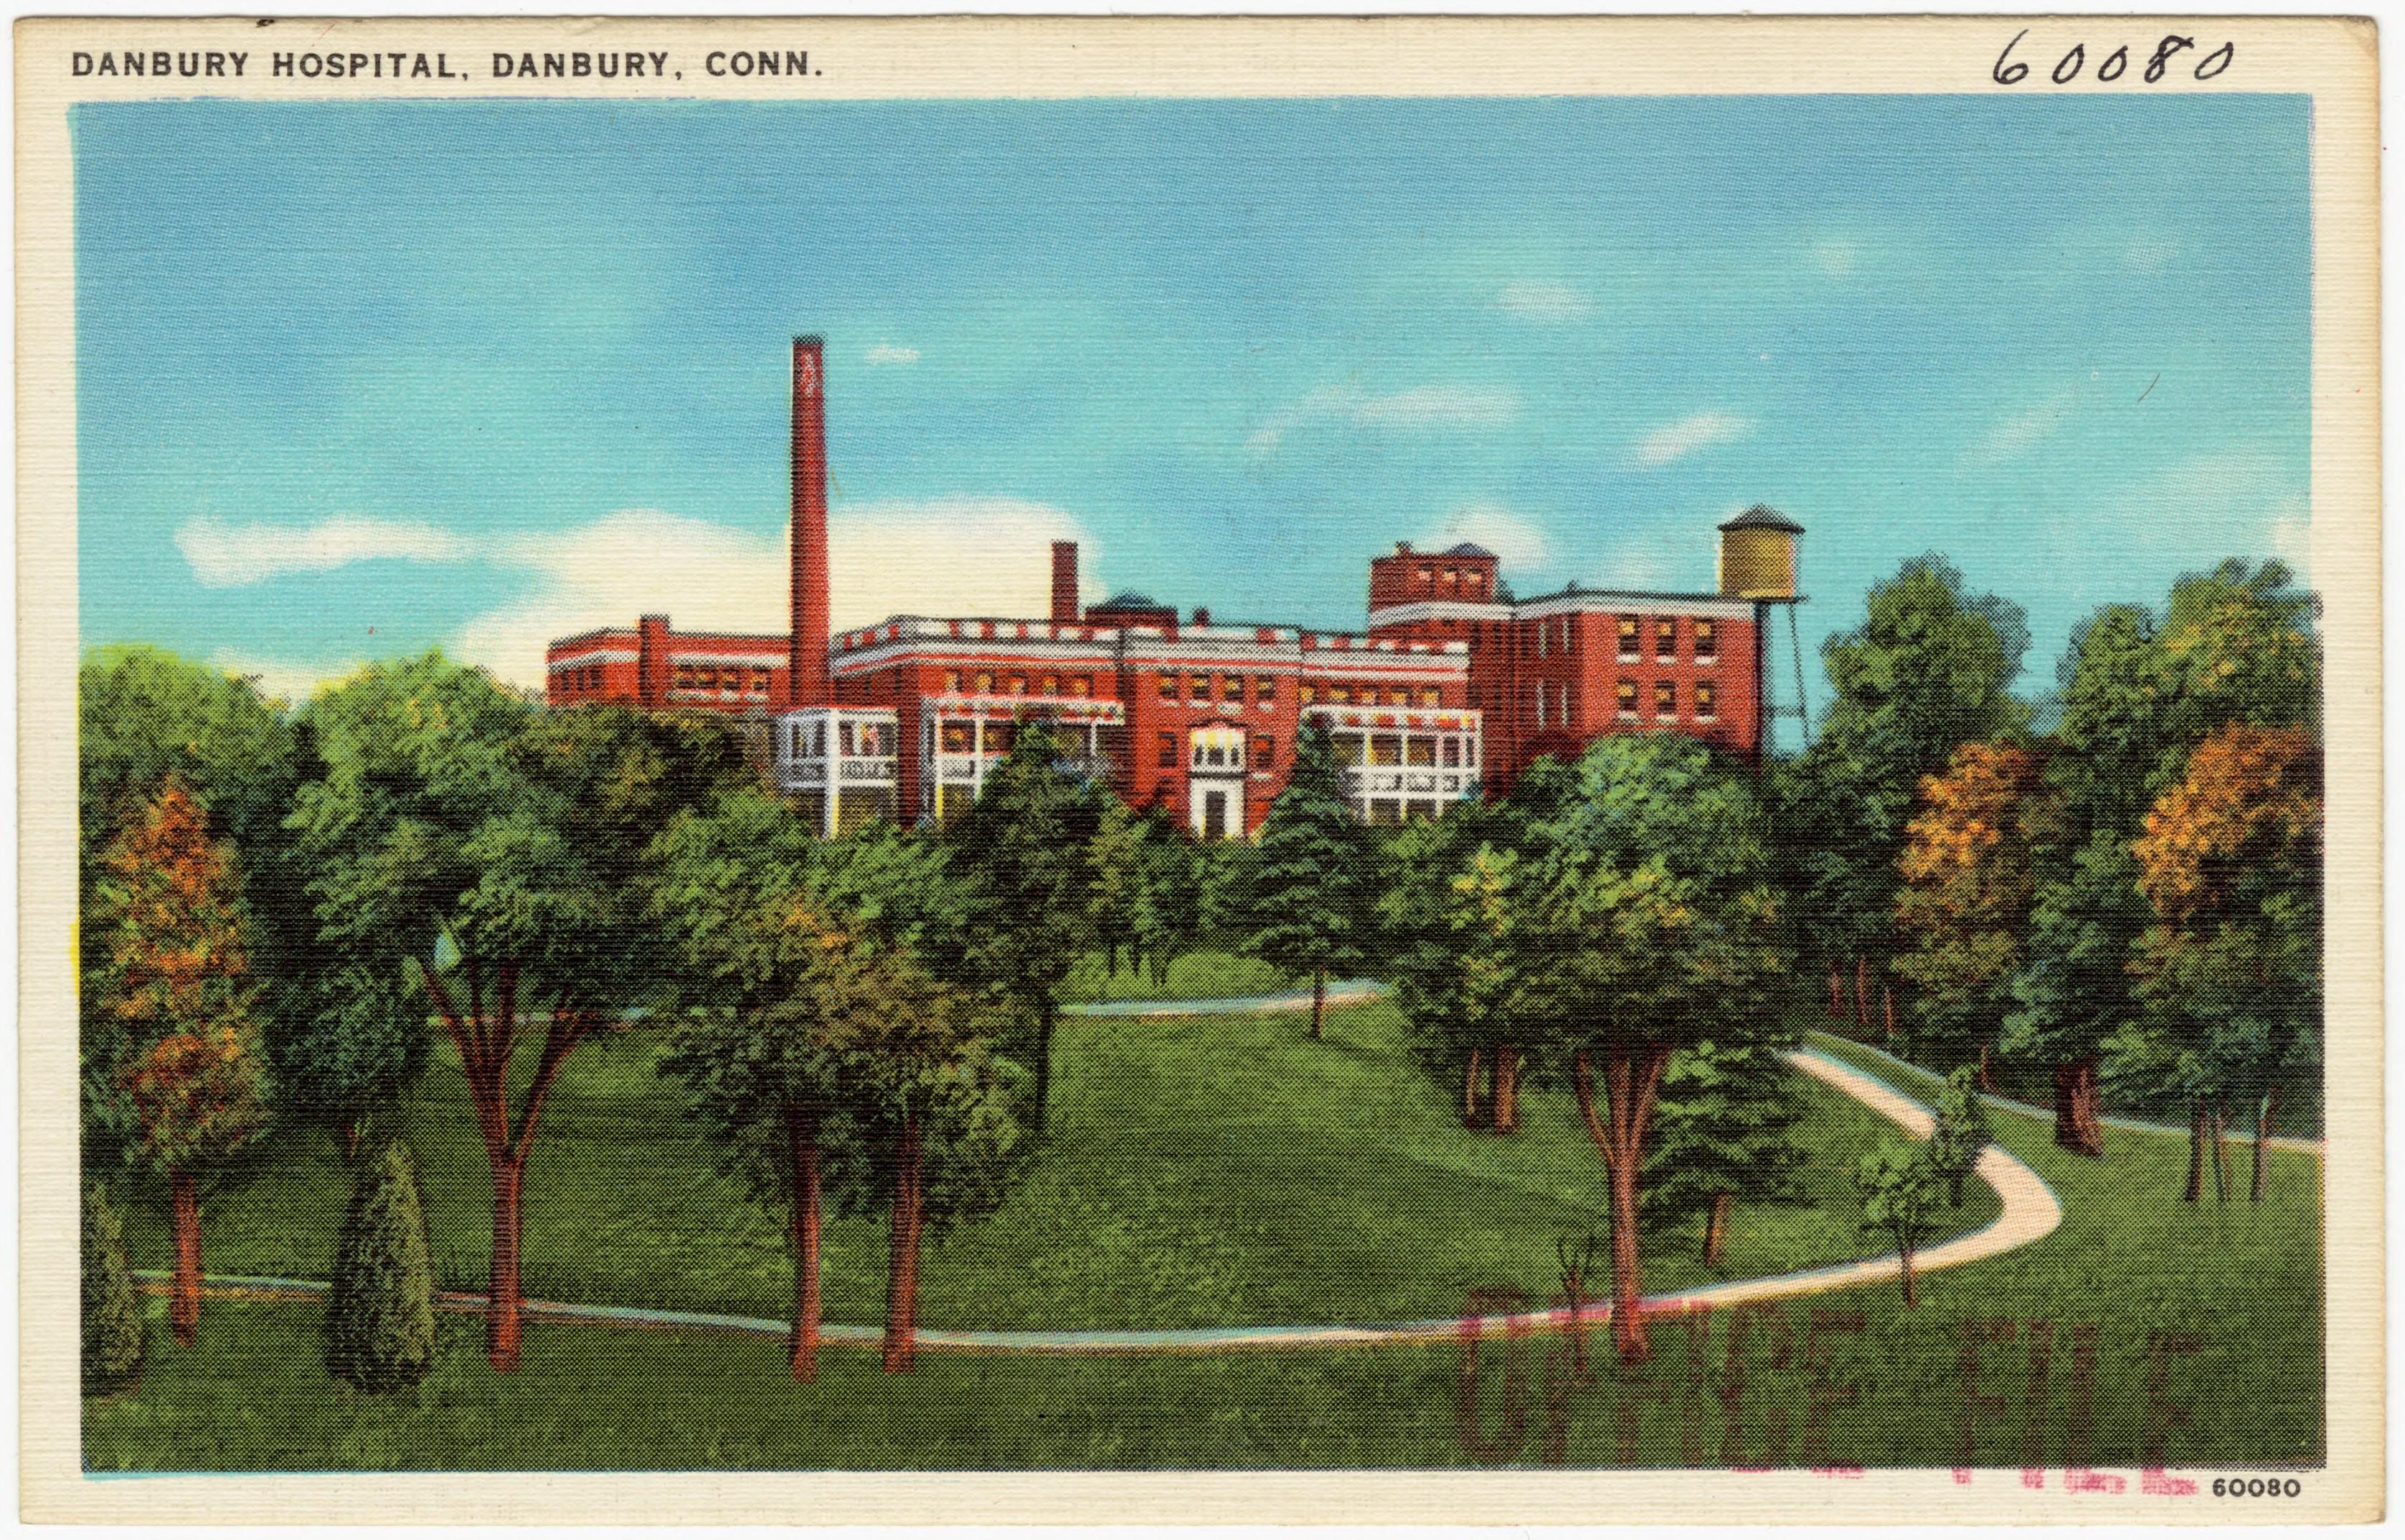 Danbury Hospital - Wikipedia